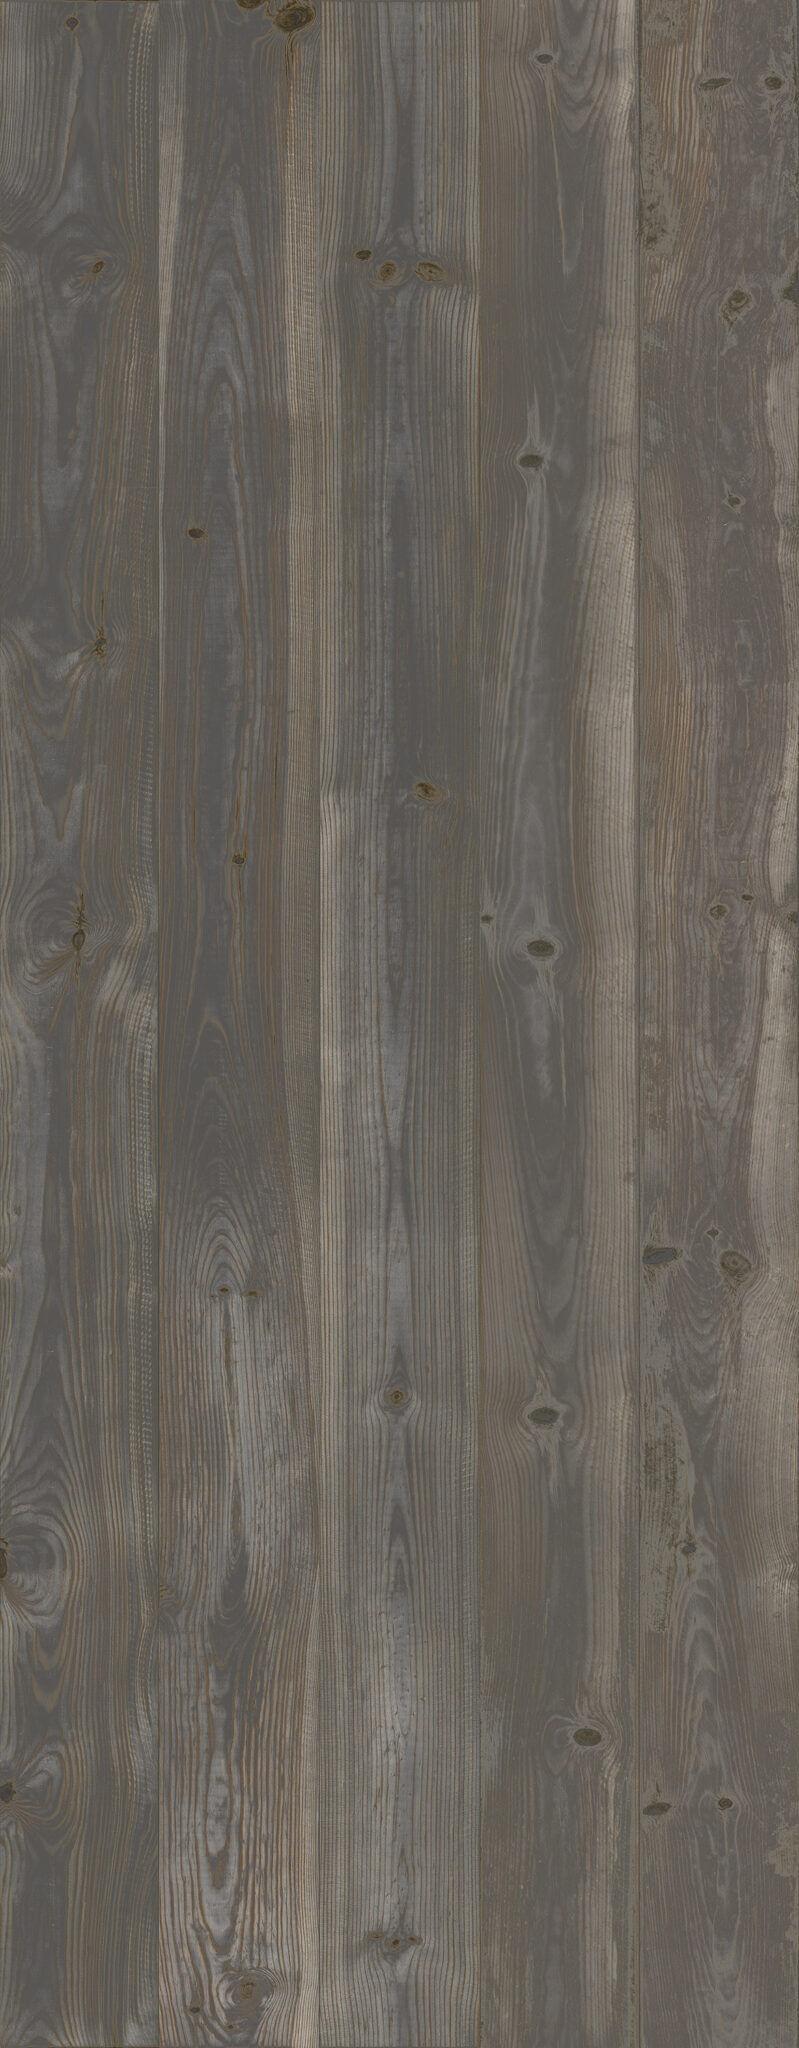 540-pine-dark-grey-10-scaled